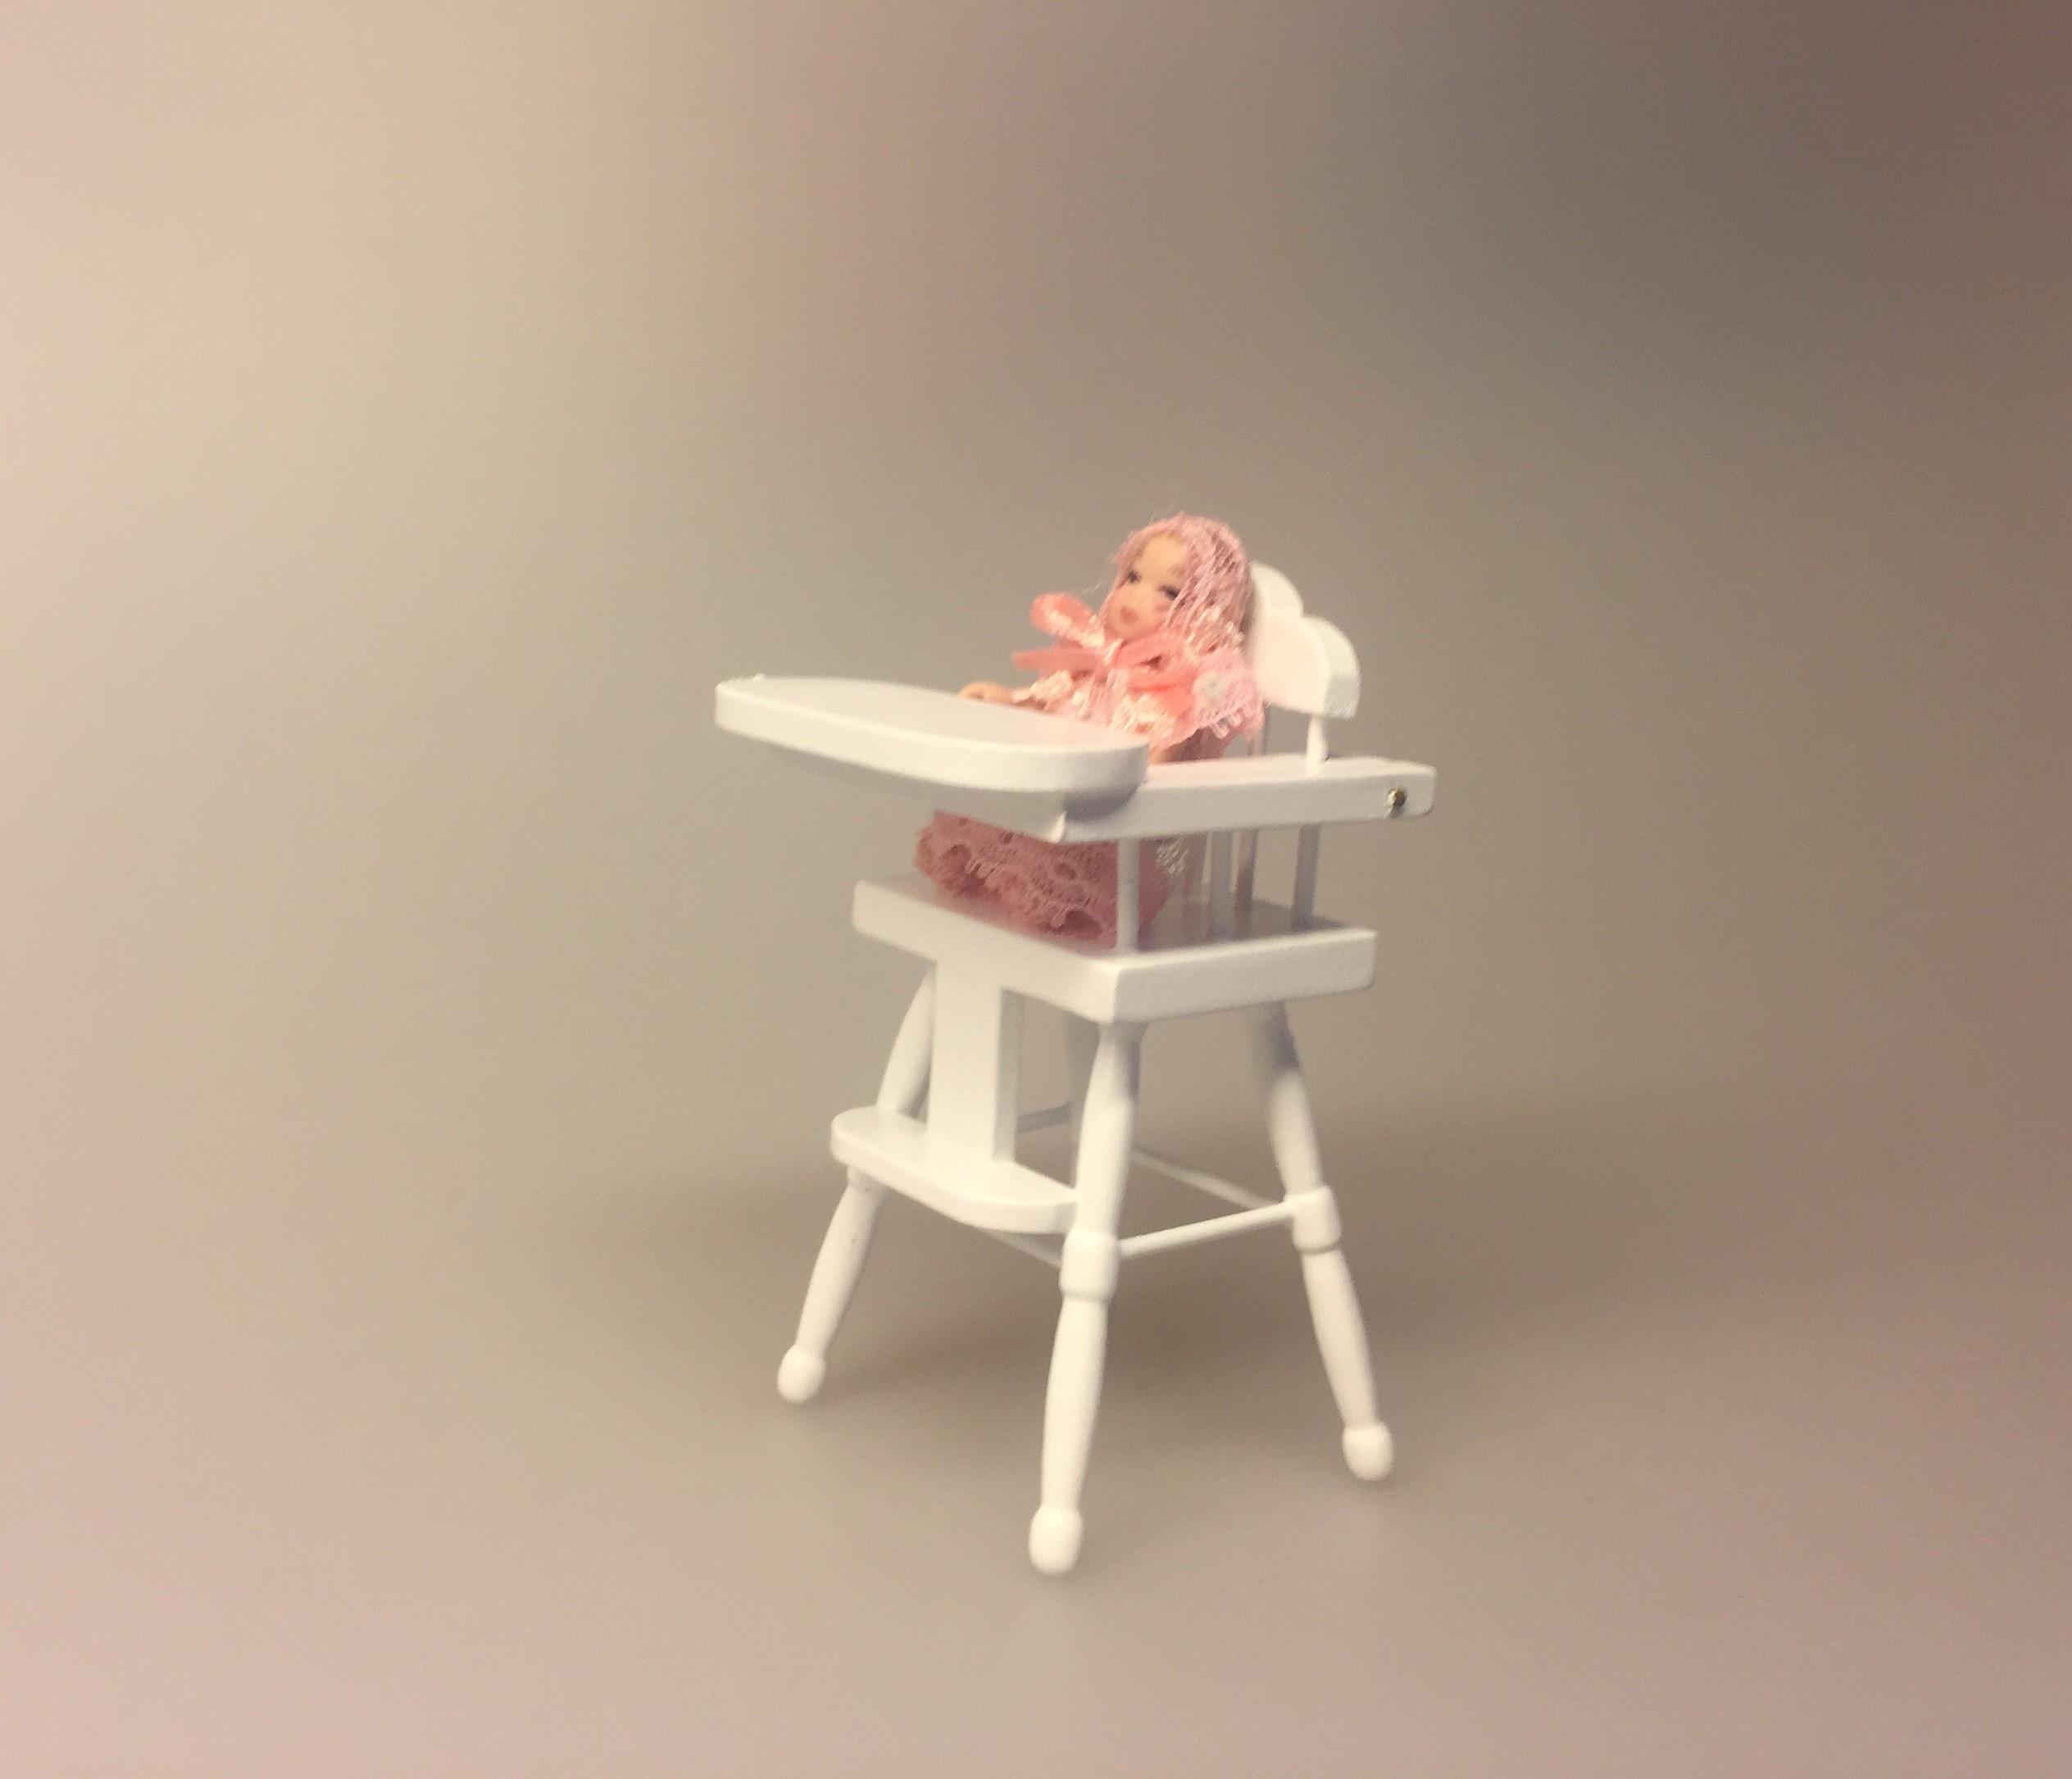 Baby rosa, babydukke, dukkebaby, dukkehusdukke, dukkehusbaby, mini, miniatyre, miniature, lille, lyserød, rosa, pink, ting til dukkehuset, miniaturen, dollhouse, biti, ribe, vadehavet